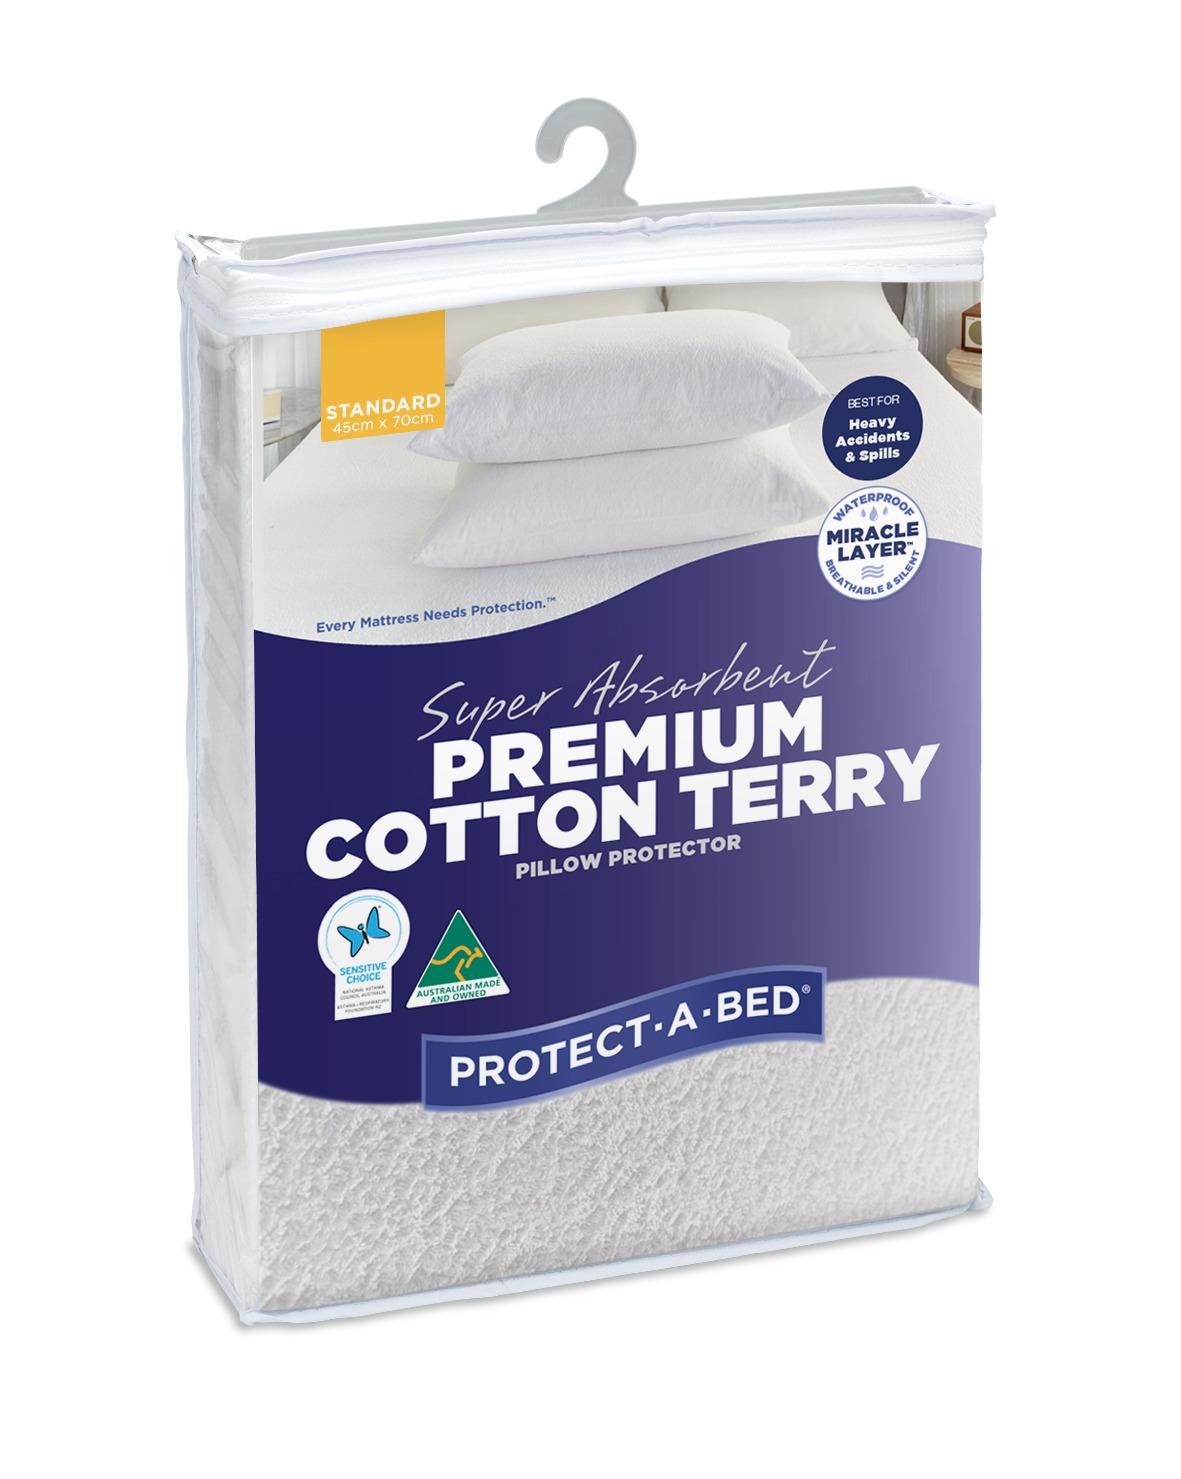 Protect A Bed Super Absorbent Premium Cotton Pillow Protectors